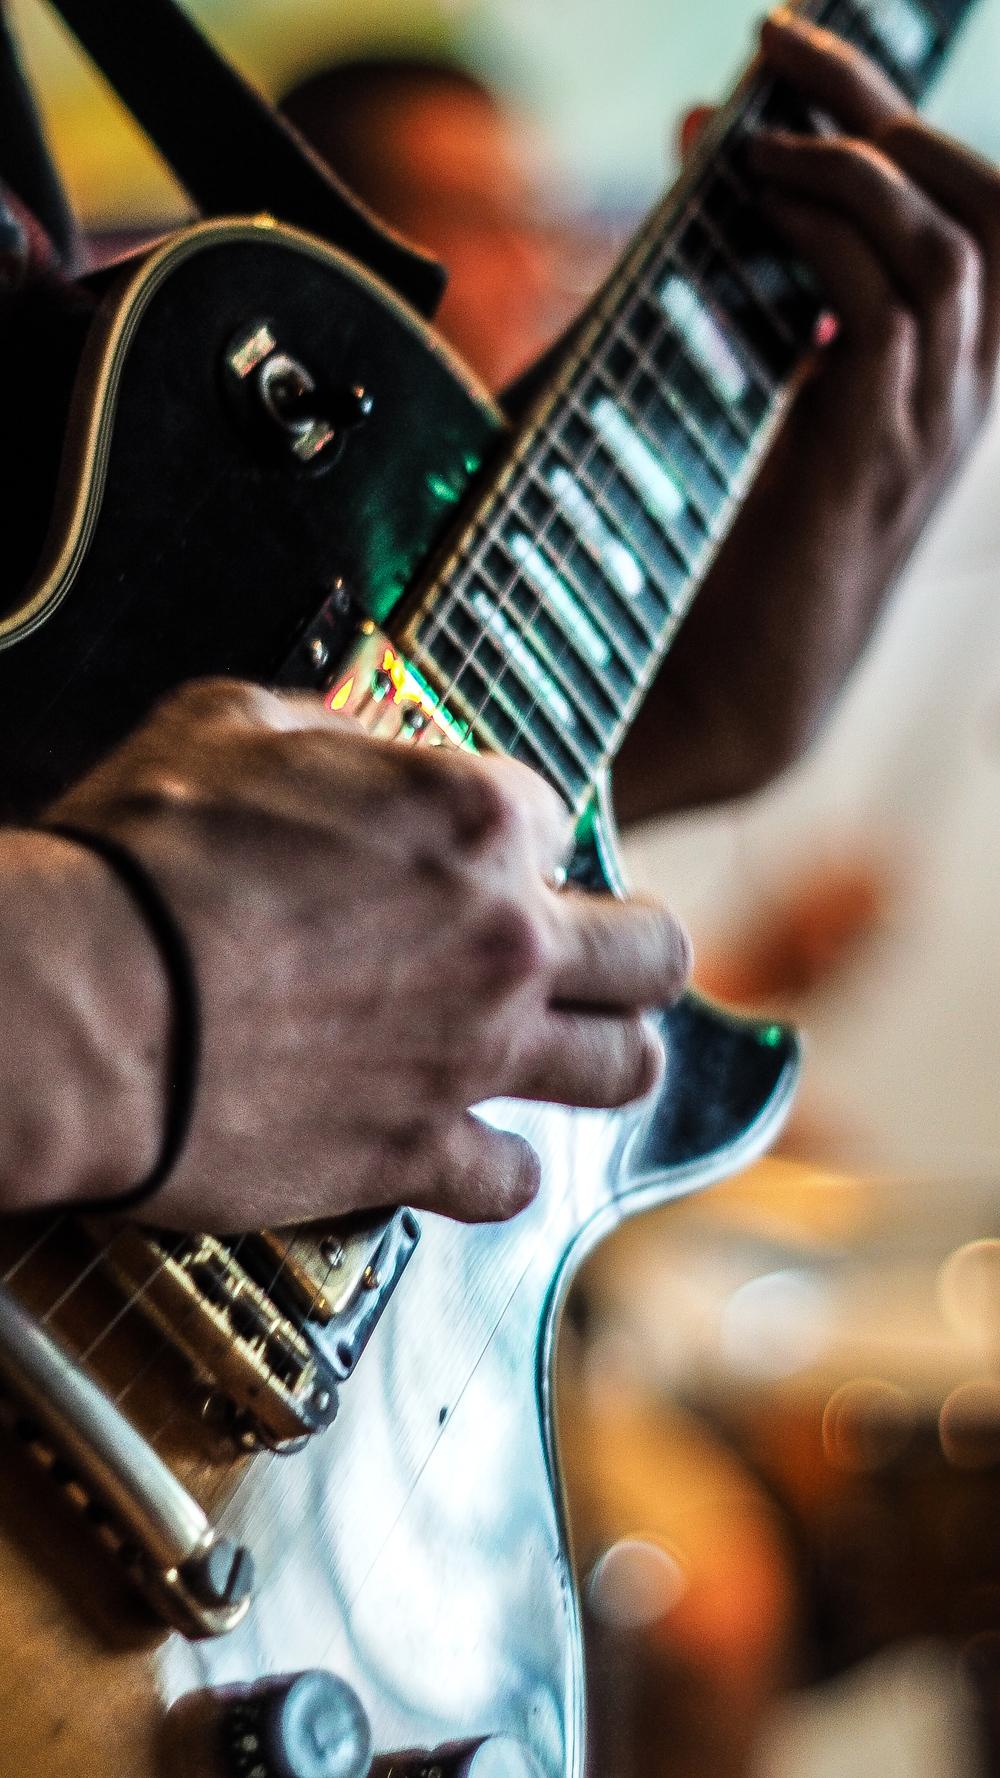 jeremy guitar 1.jpg